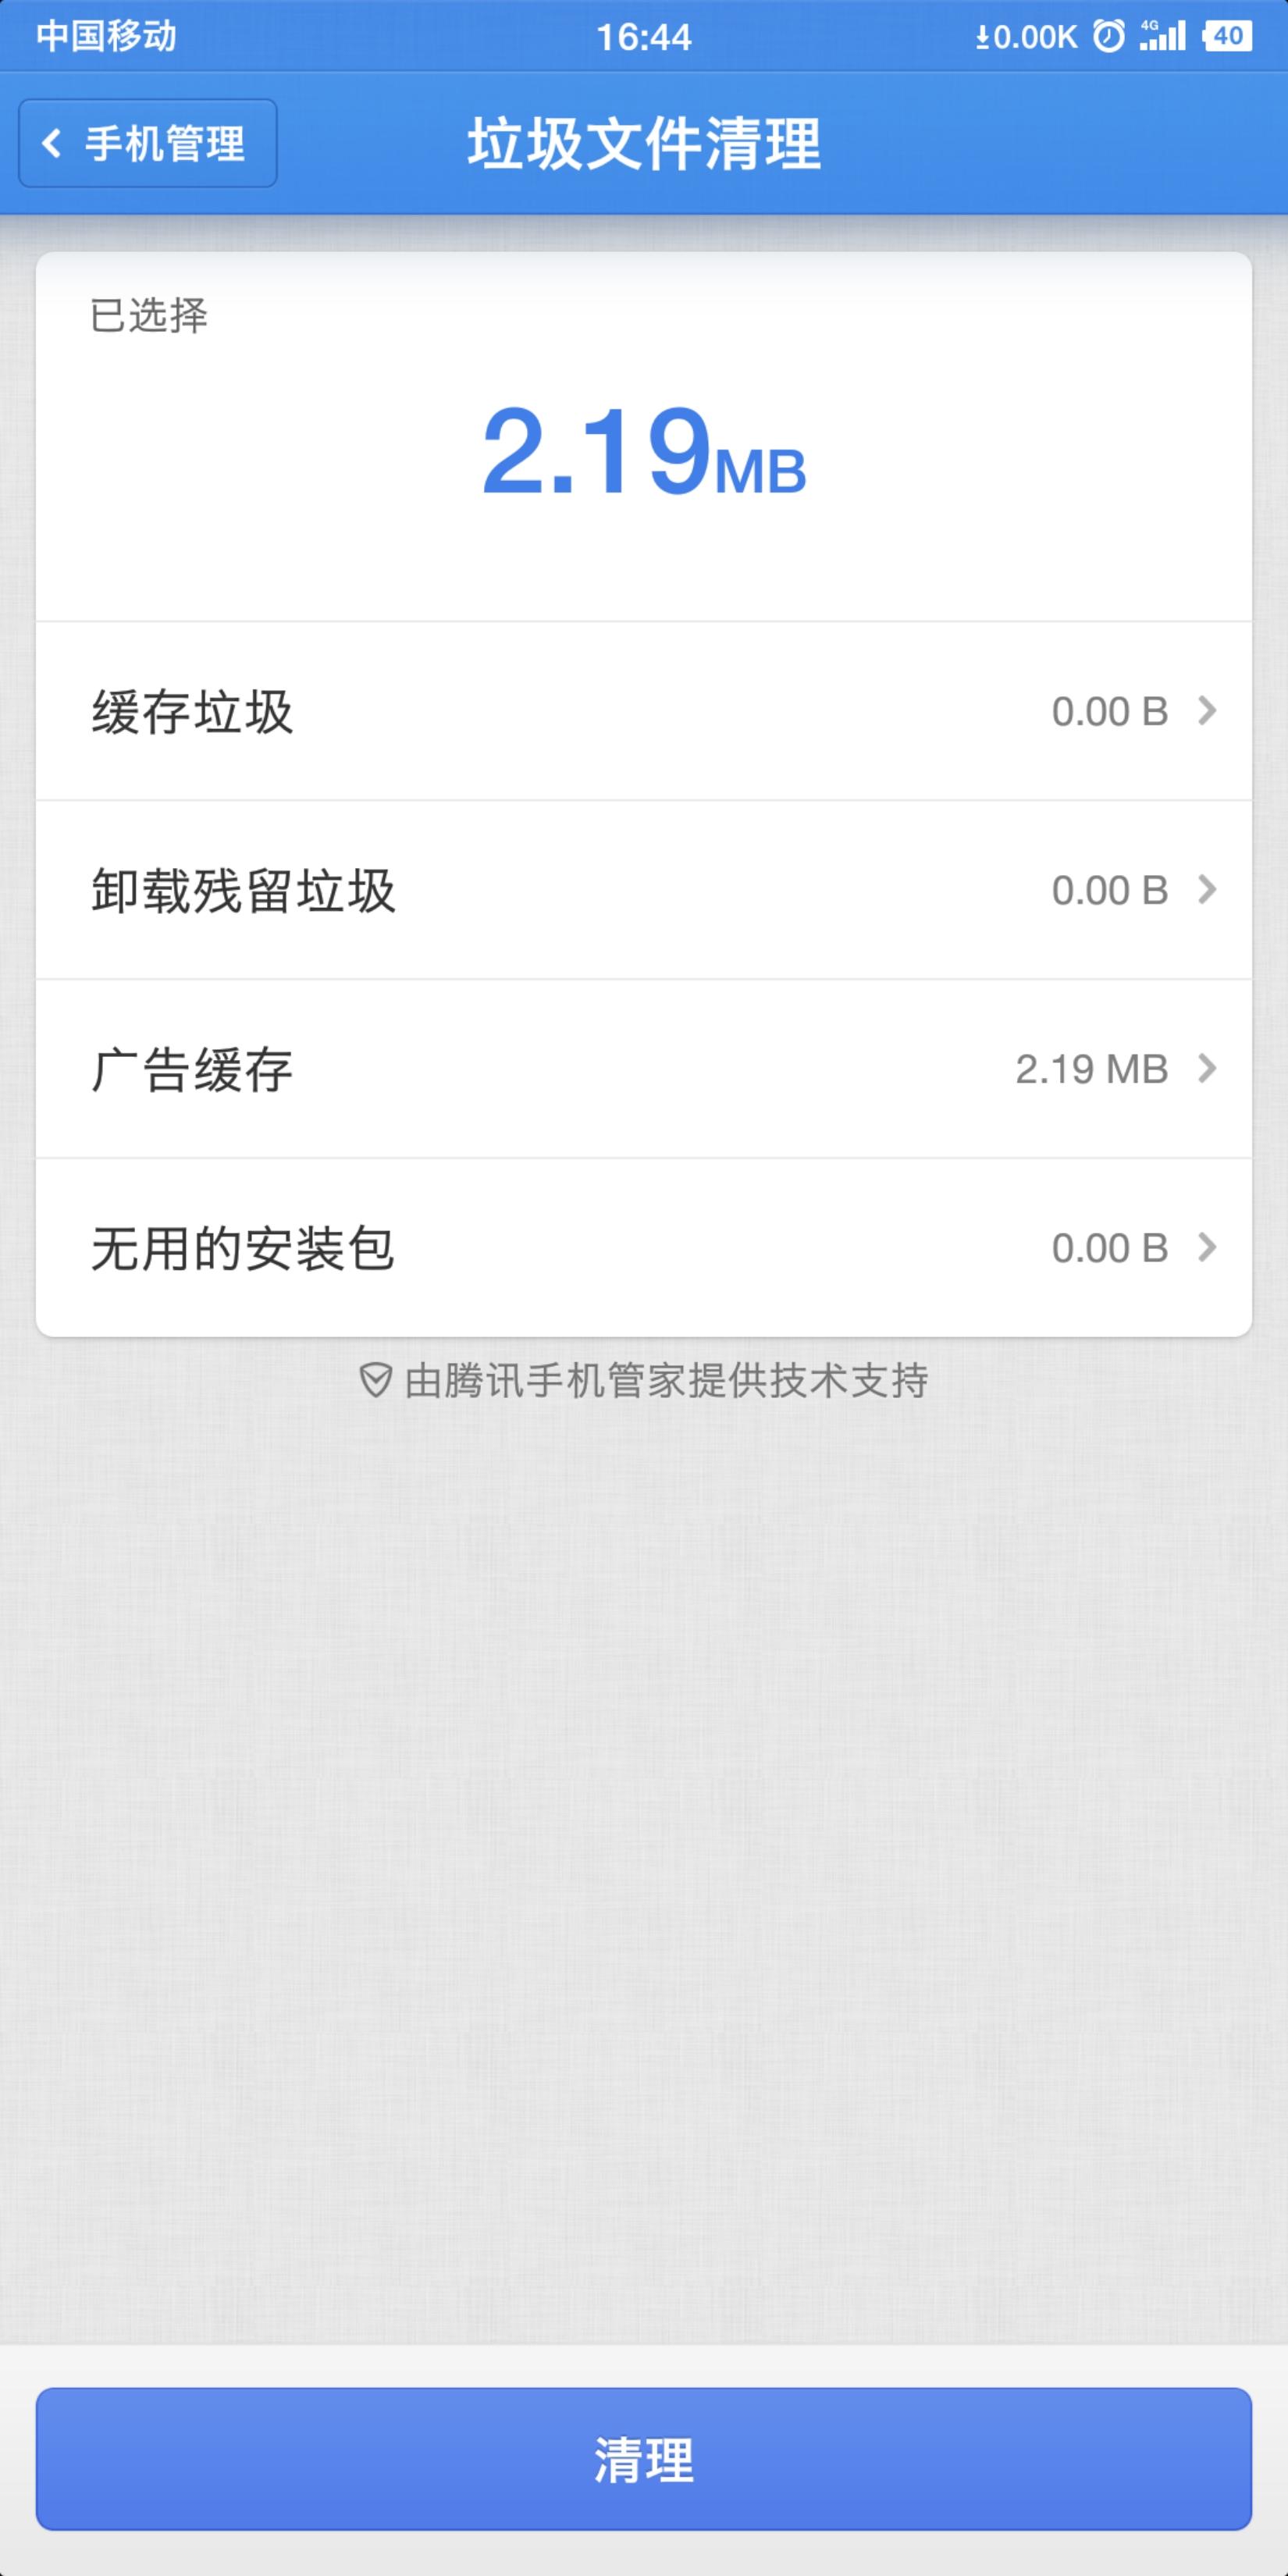 Screenshot_2019-02-12-16-44-48-409_????.png